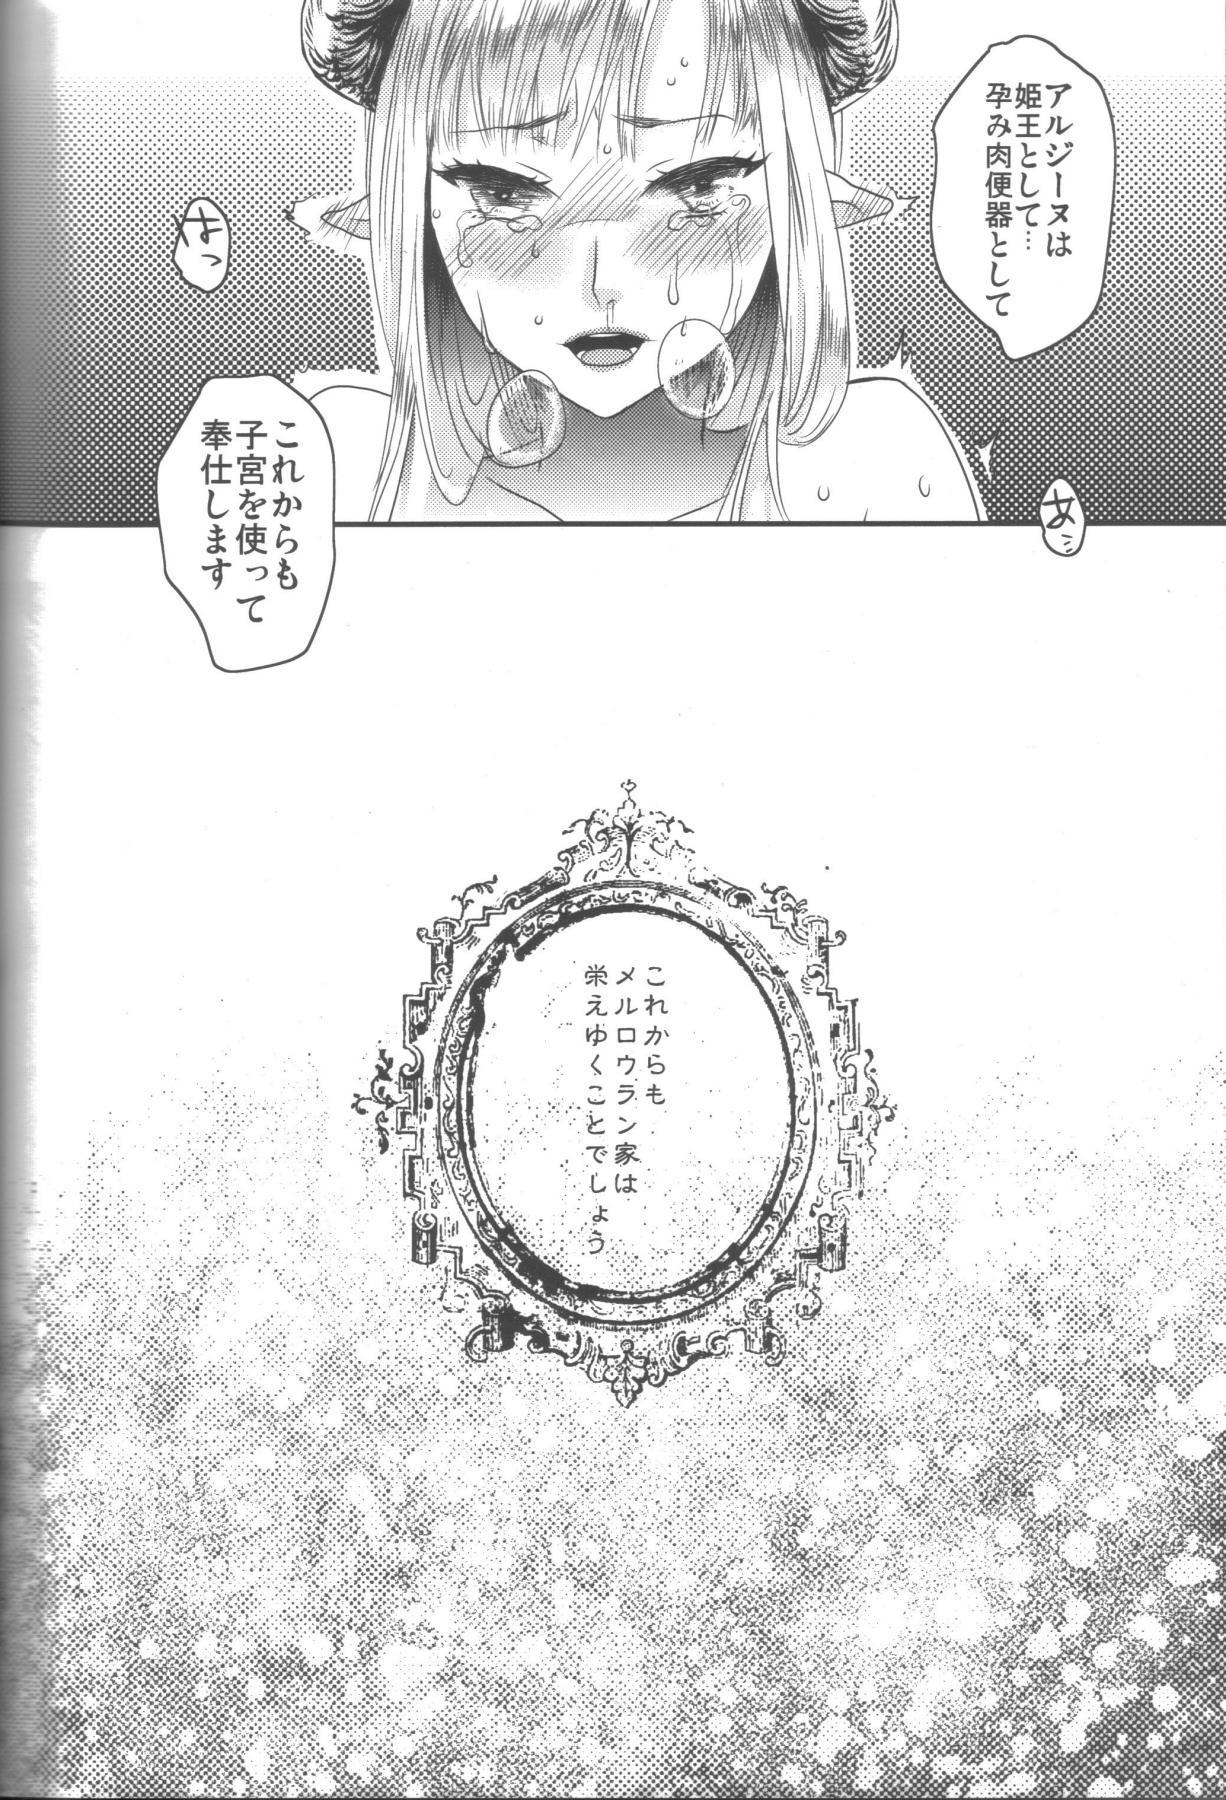 (C78) [Pish Lover (Amatake Akewo)] Hime Ouji-sama wa Harami-goro 30